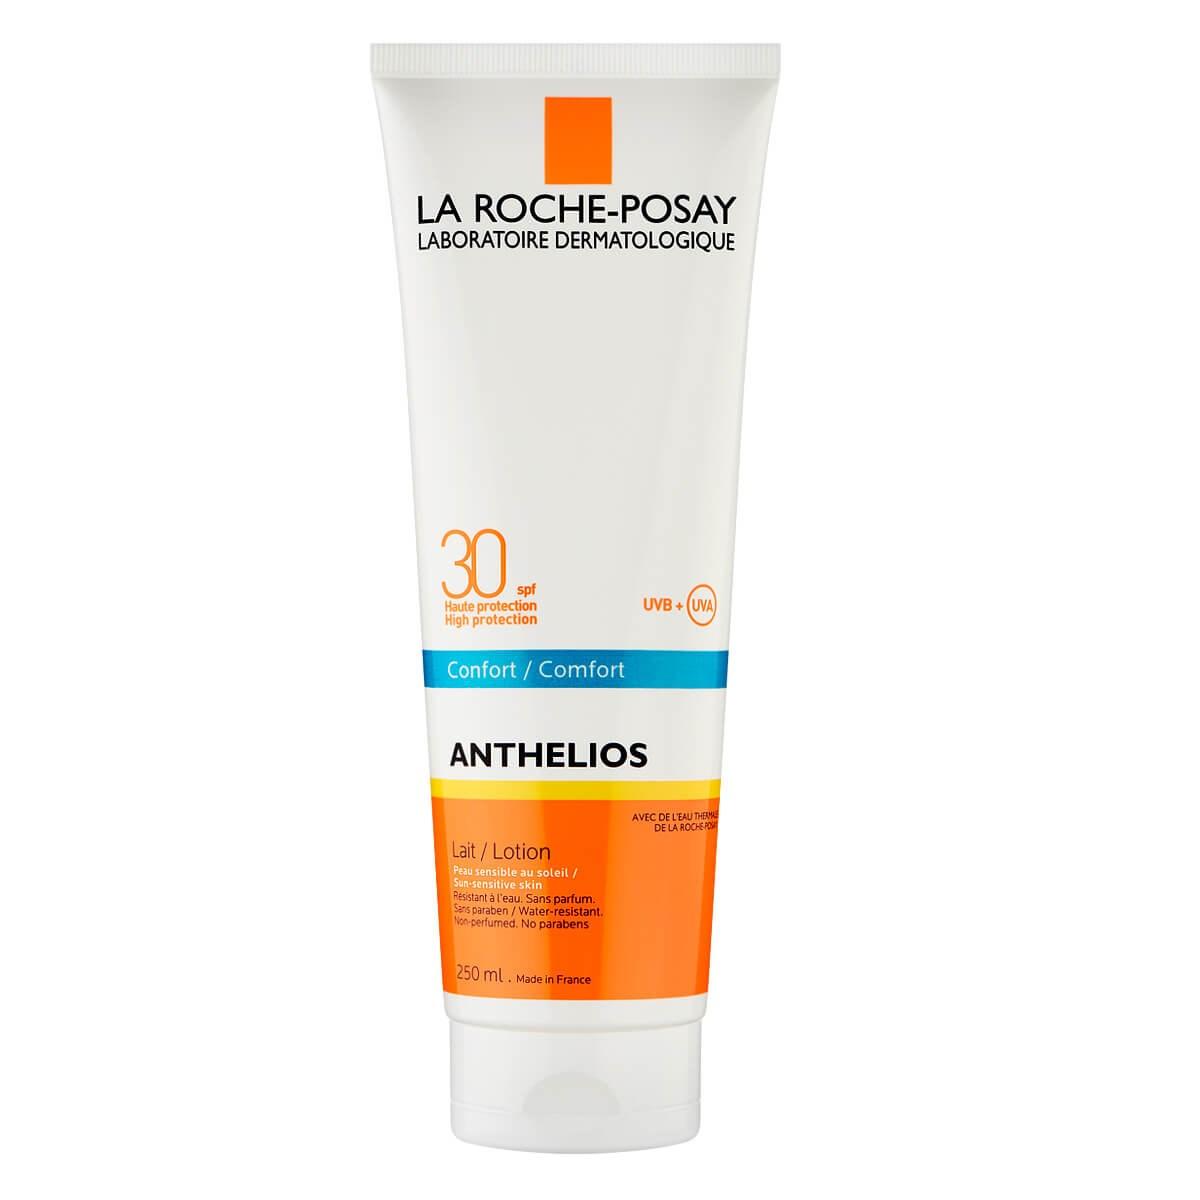 La Roche-Posay Anthelios Body Milk SPF30